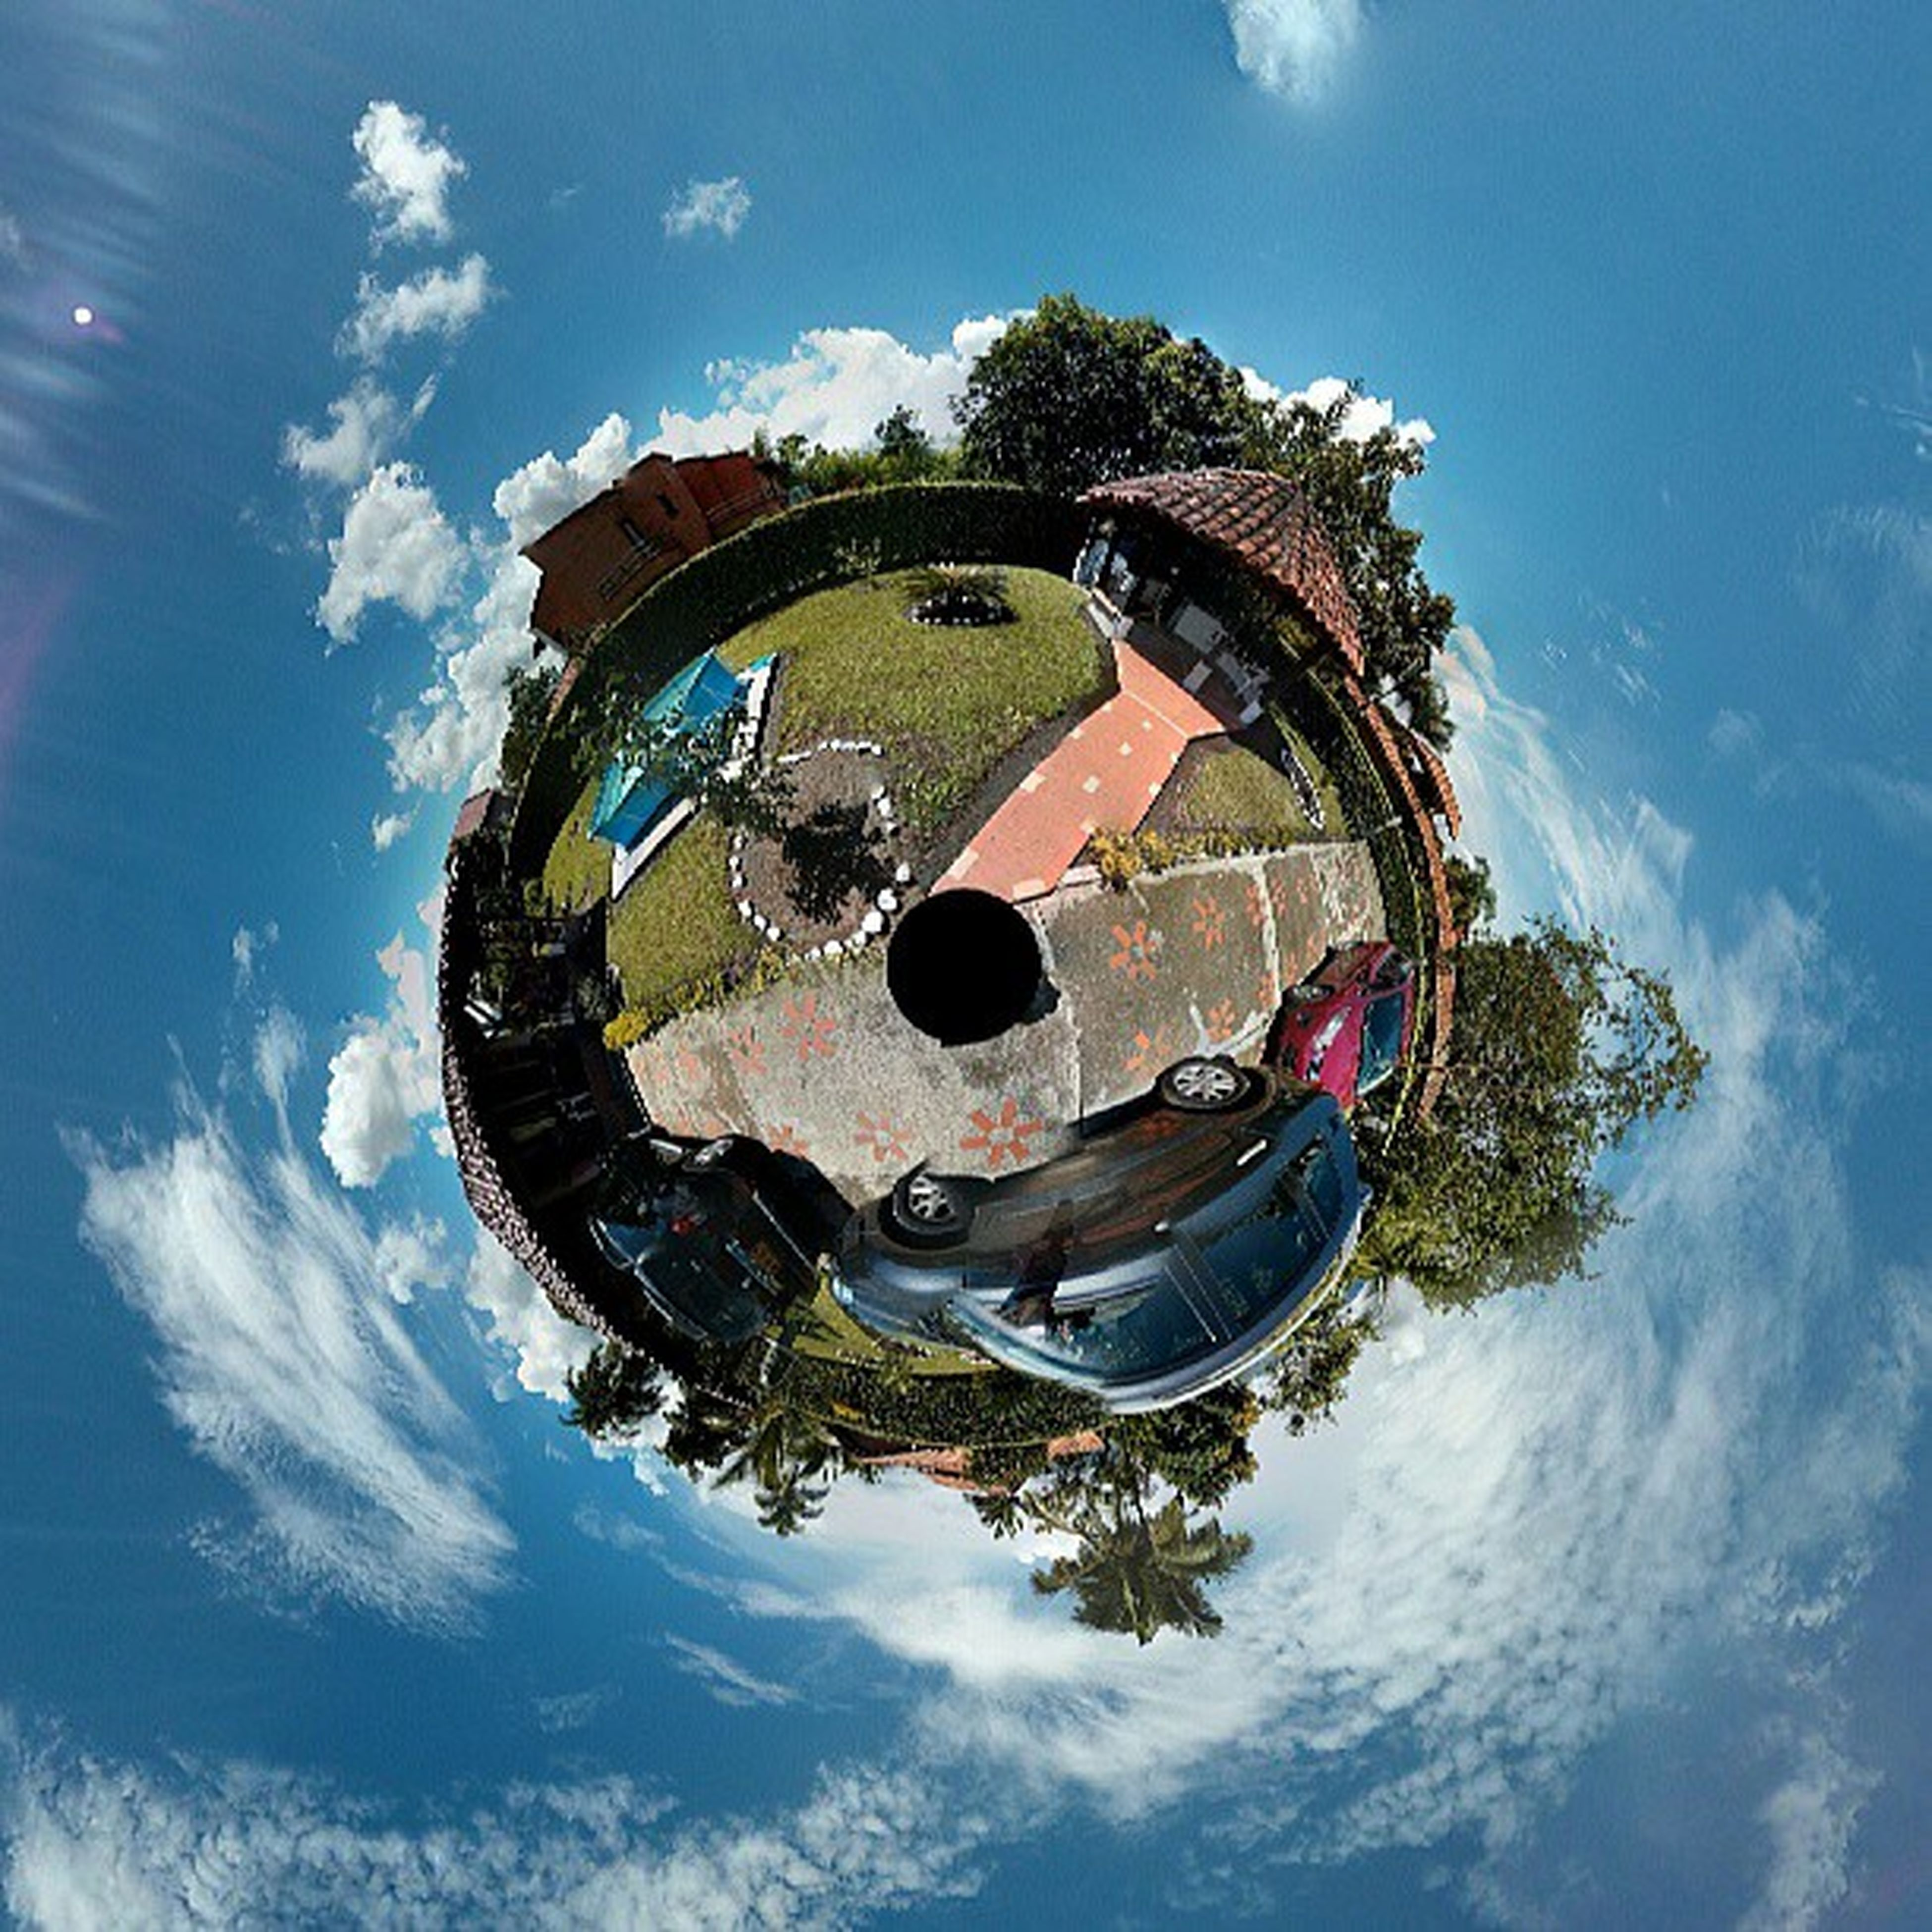 sky, cloud - sky, circle, ferris wheel, cloud, built structure, low angle view, blue, day, water, fish-eye lens, outdoors, reflection, architecture, sunlight, nature, amusement park, amusement park ride, arts culture and entertainment, no people